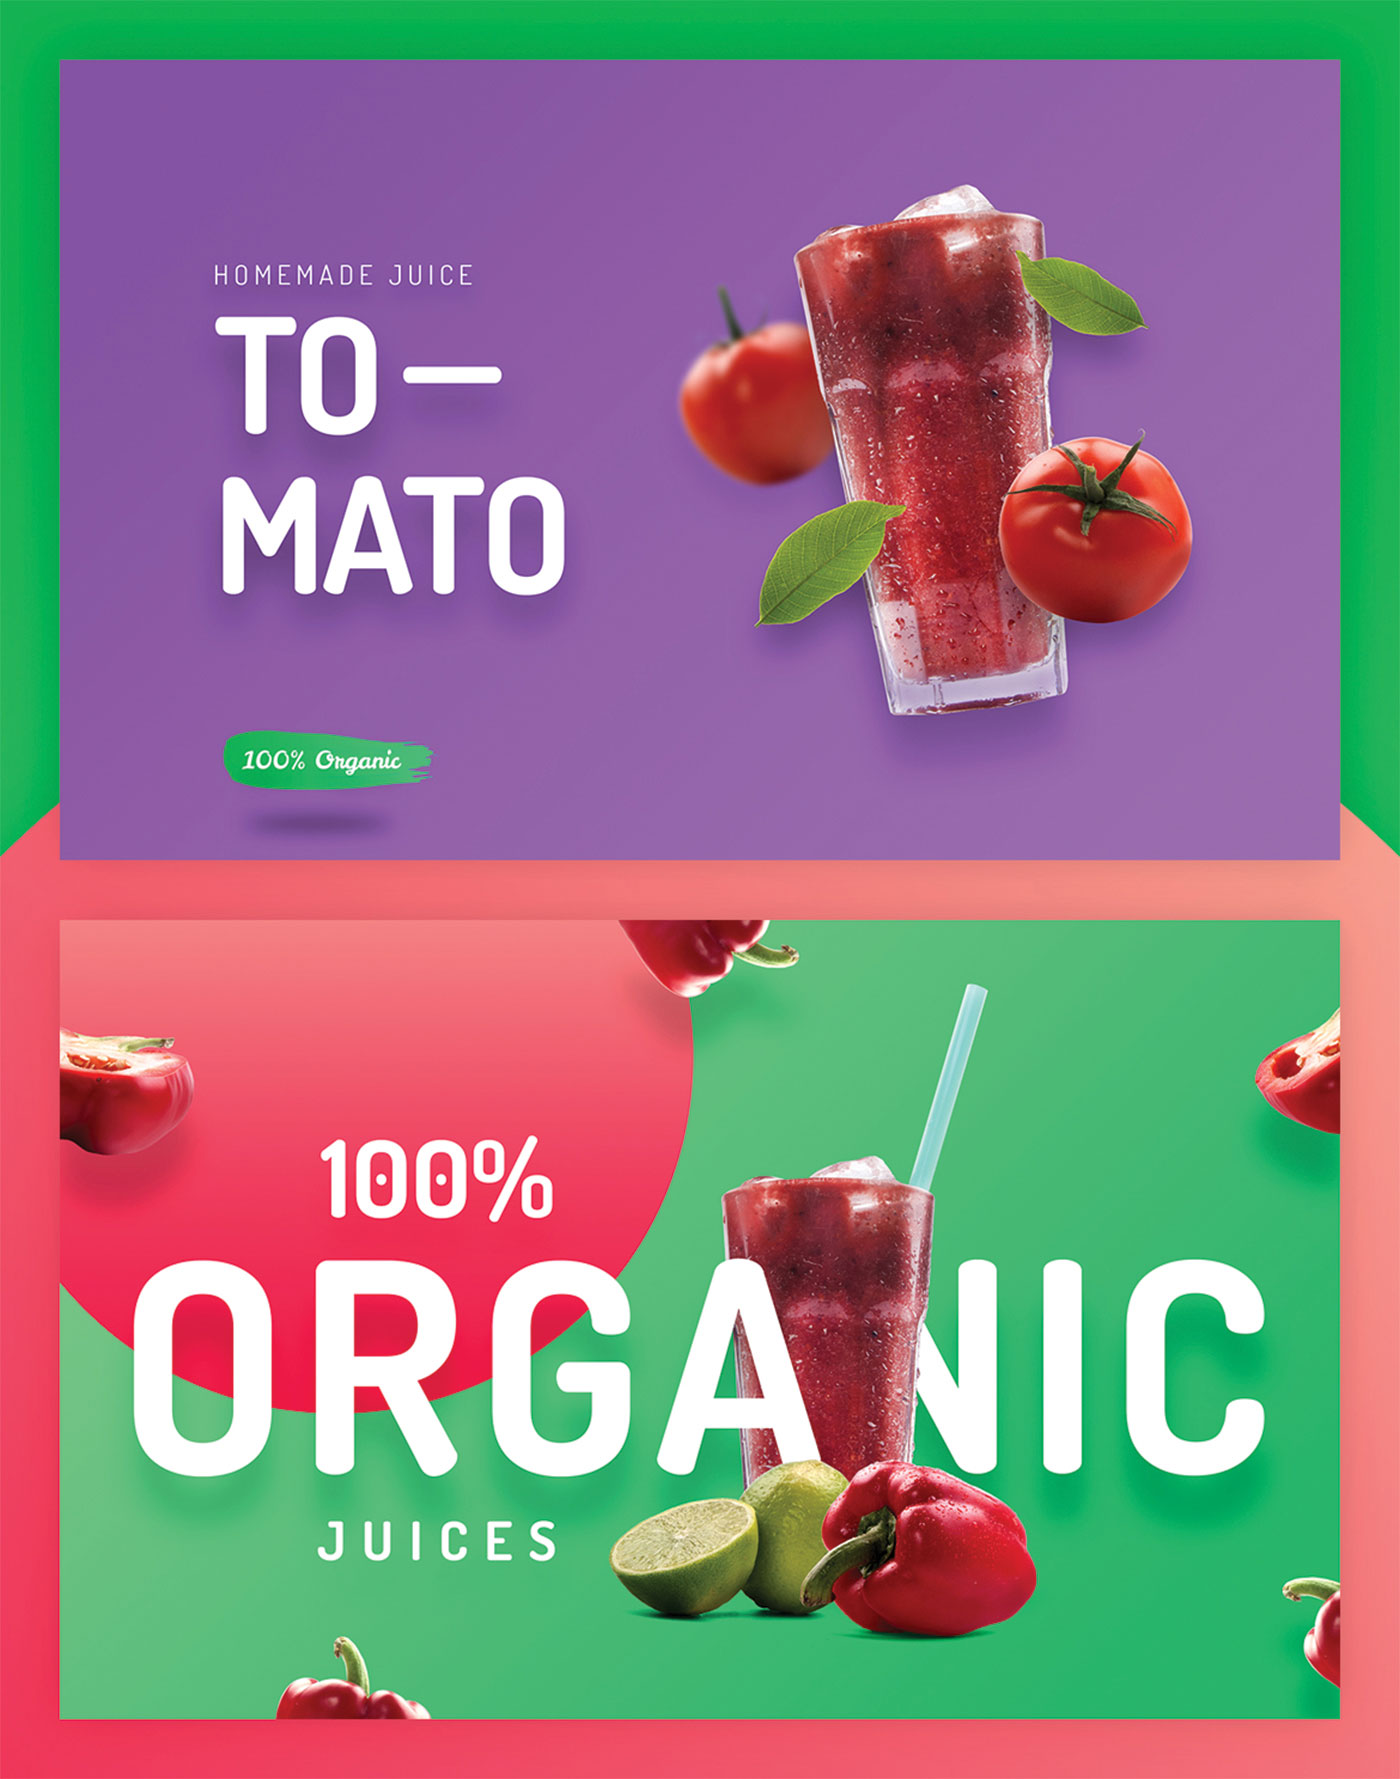 Fresh juice and tomato